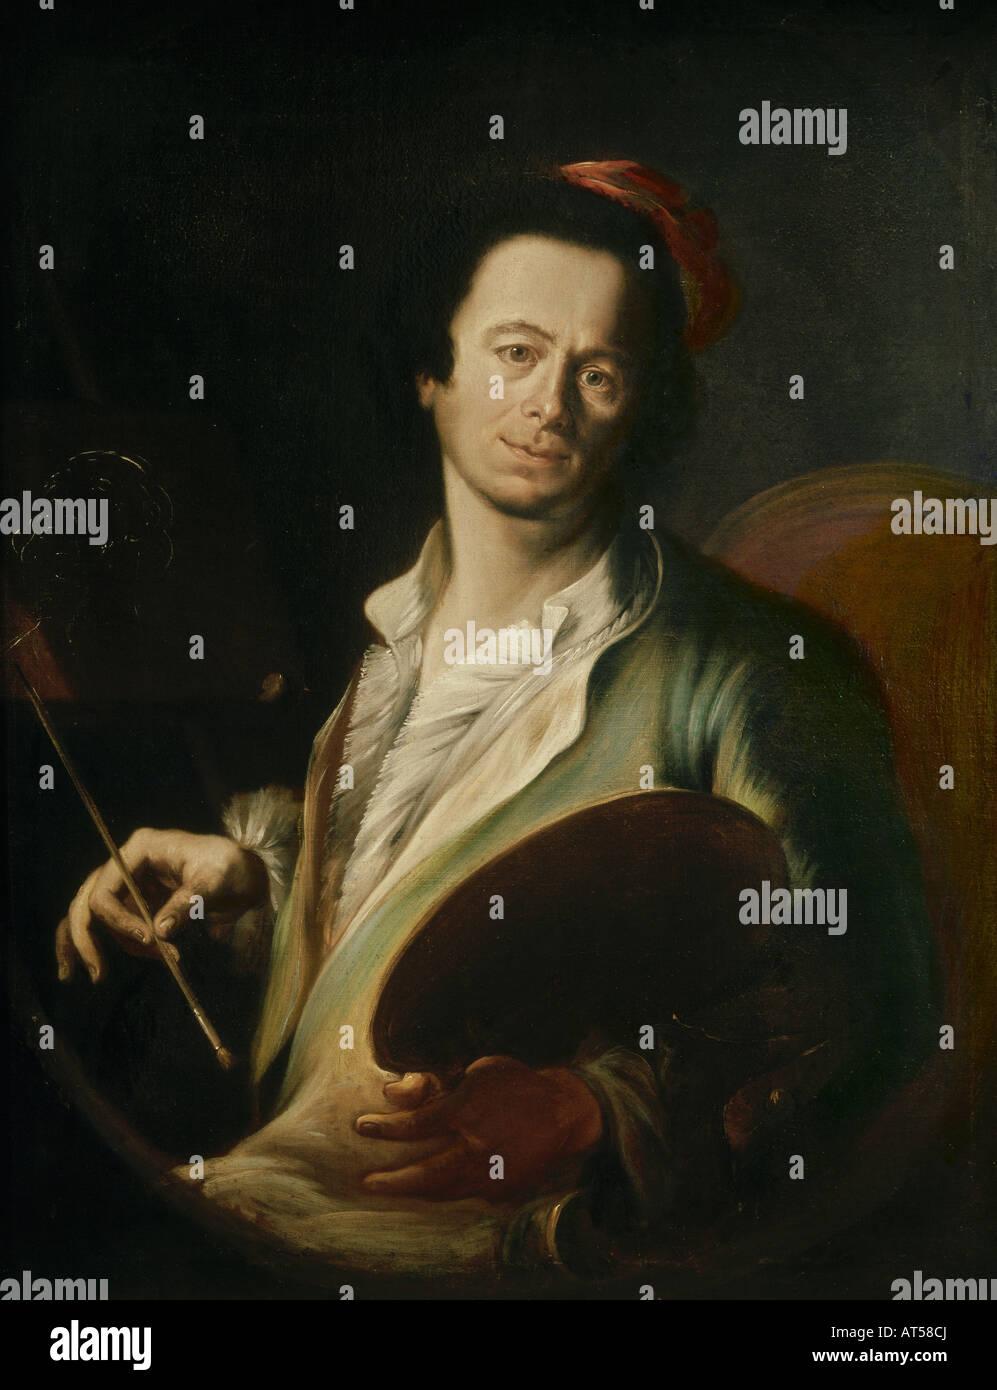 fine arts, Asam, Cosmas Damian (1686 - 1739), painting, self-portrait, 18th century, oil on canvas, Bavarian National - Stock Image